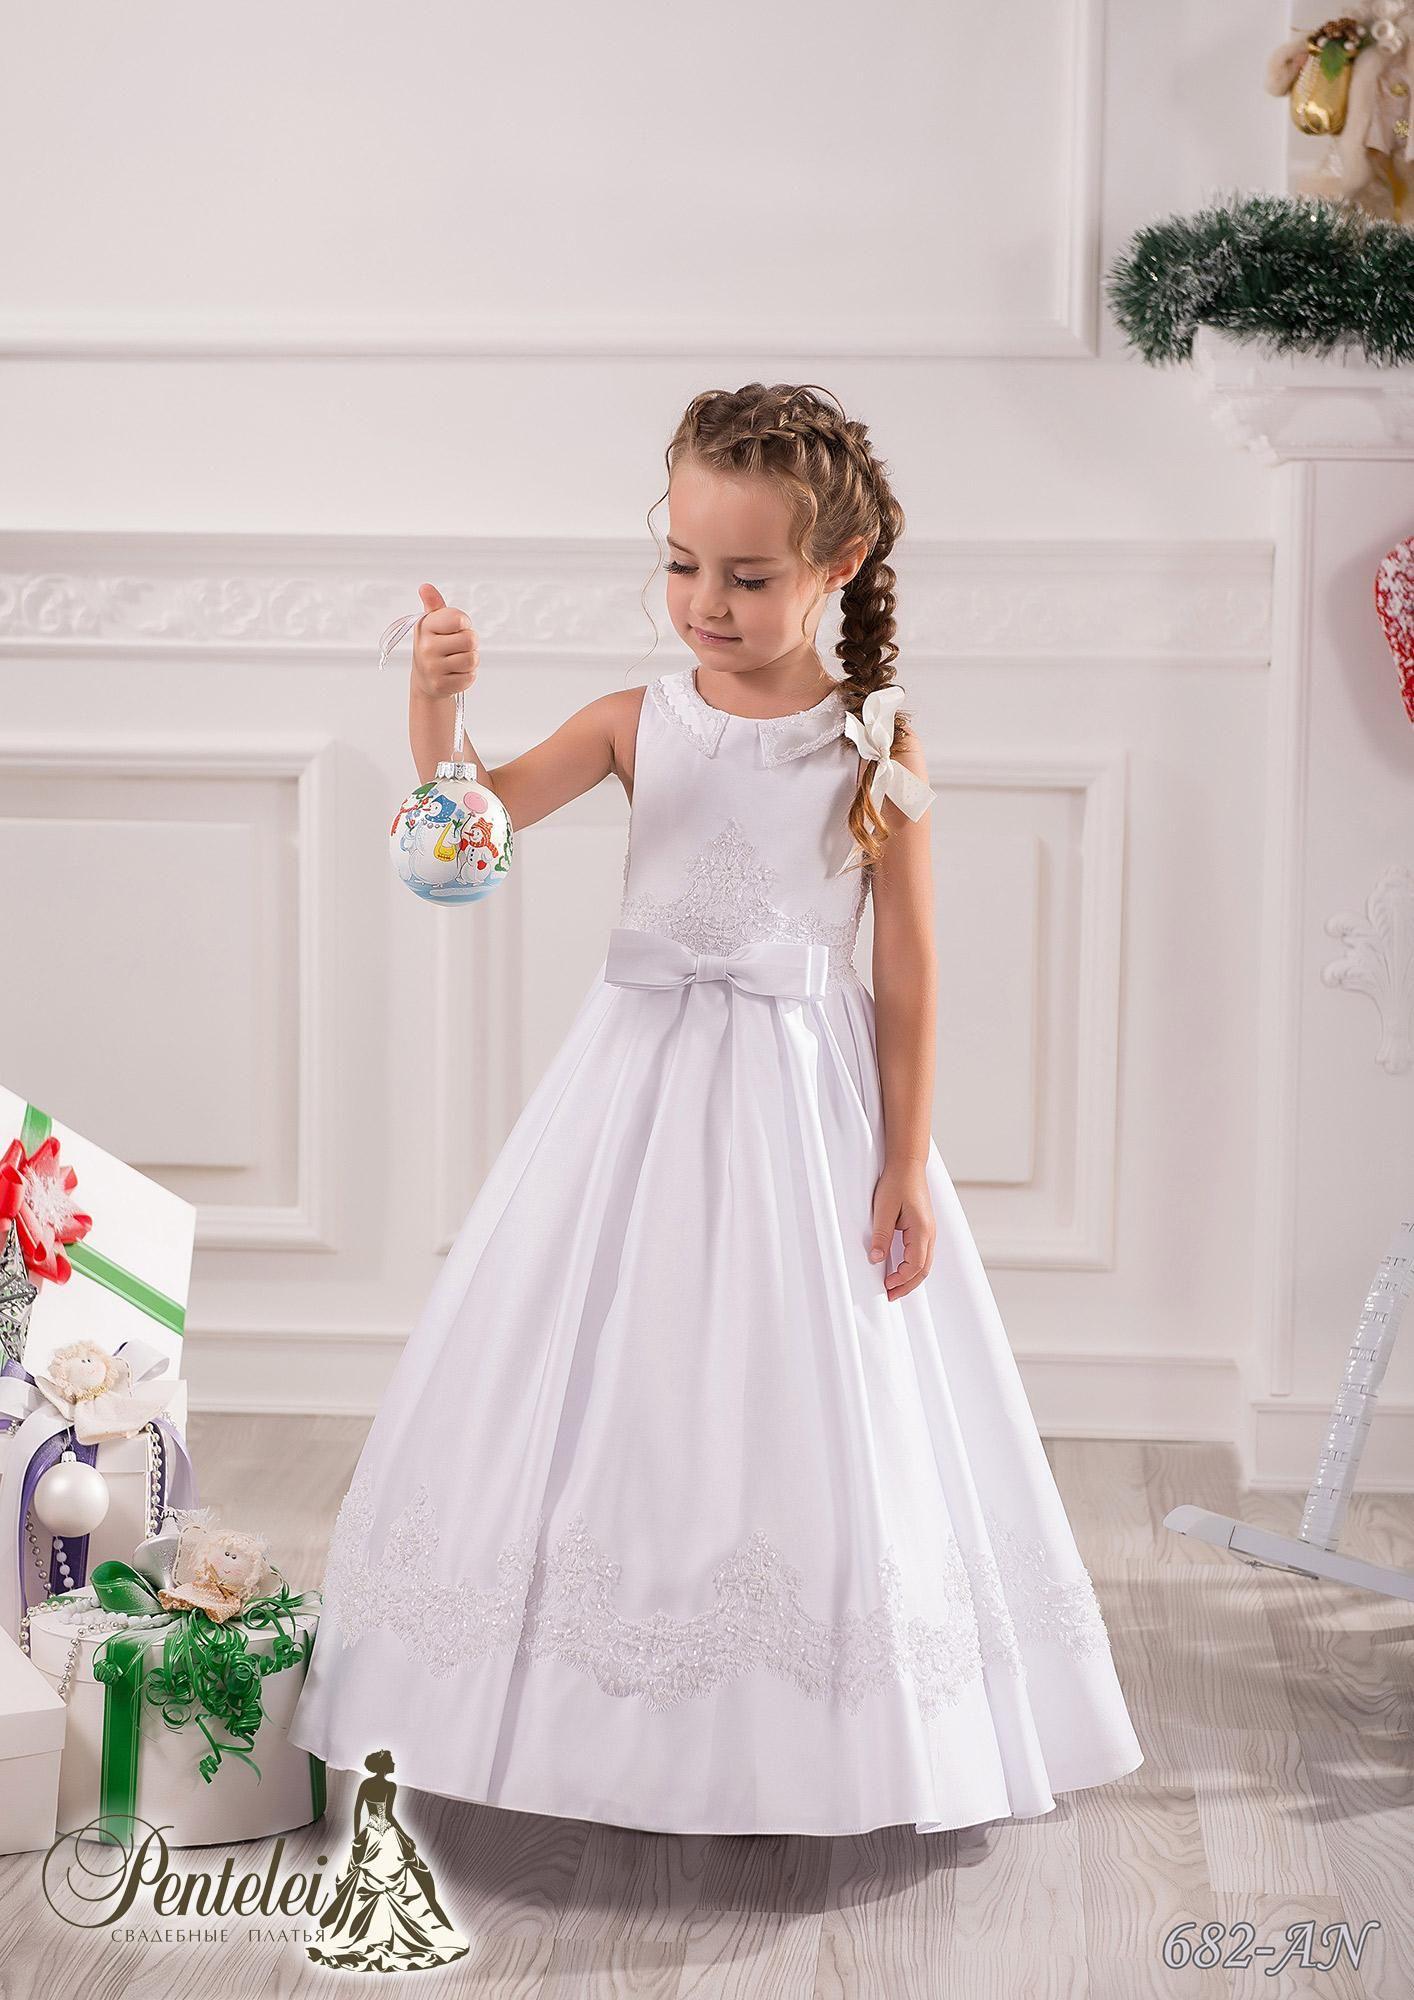 Bweatiful Flower Girls Dresses for Weddings with Jewel Collar ...